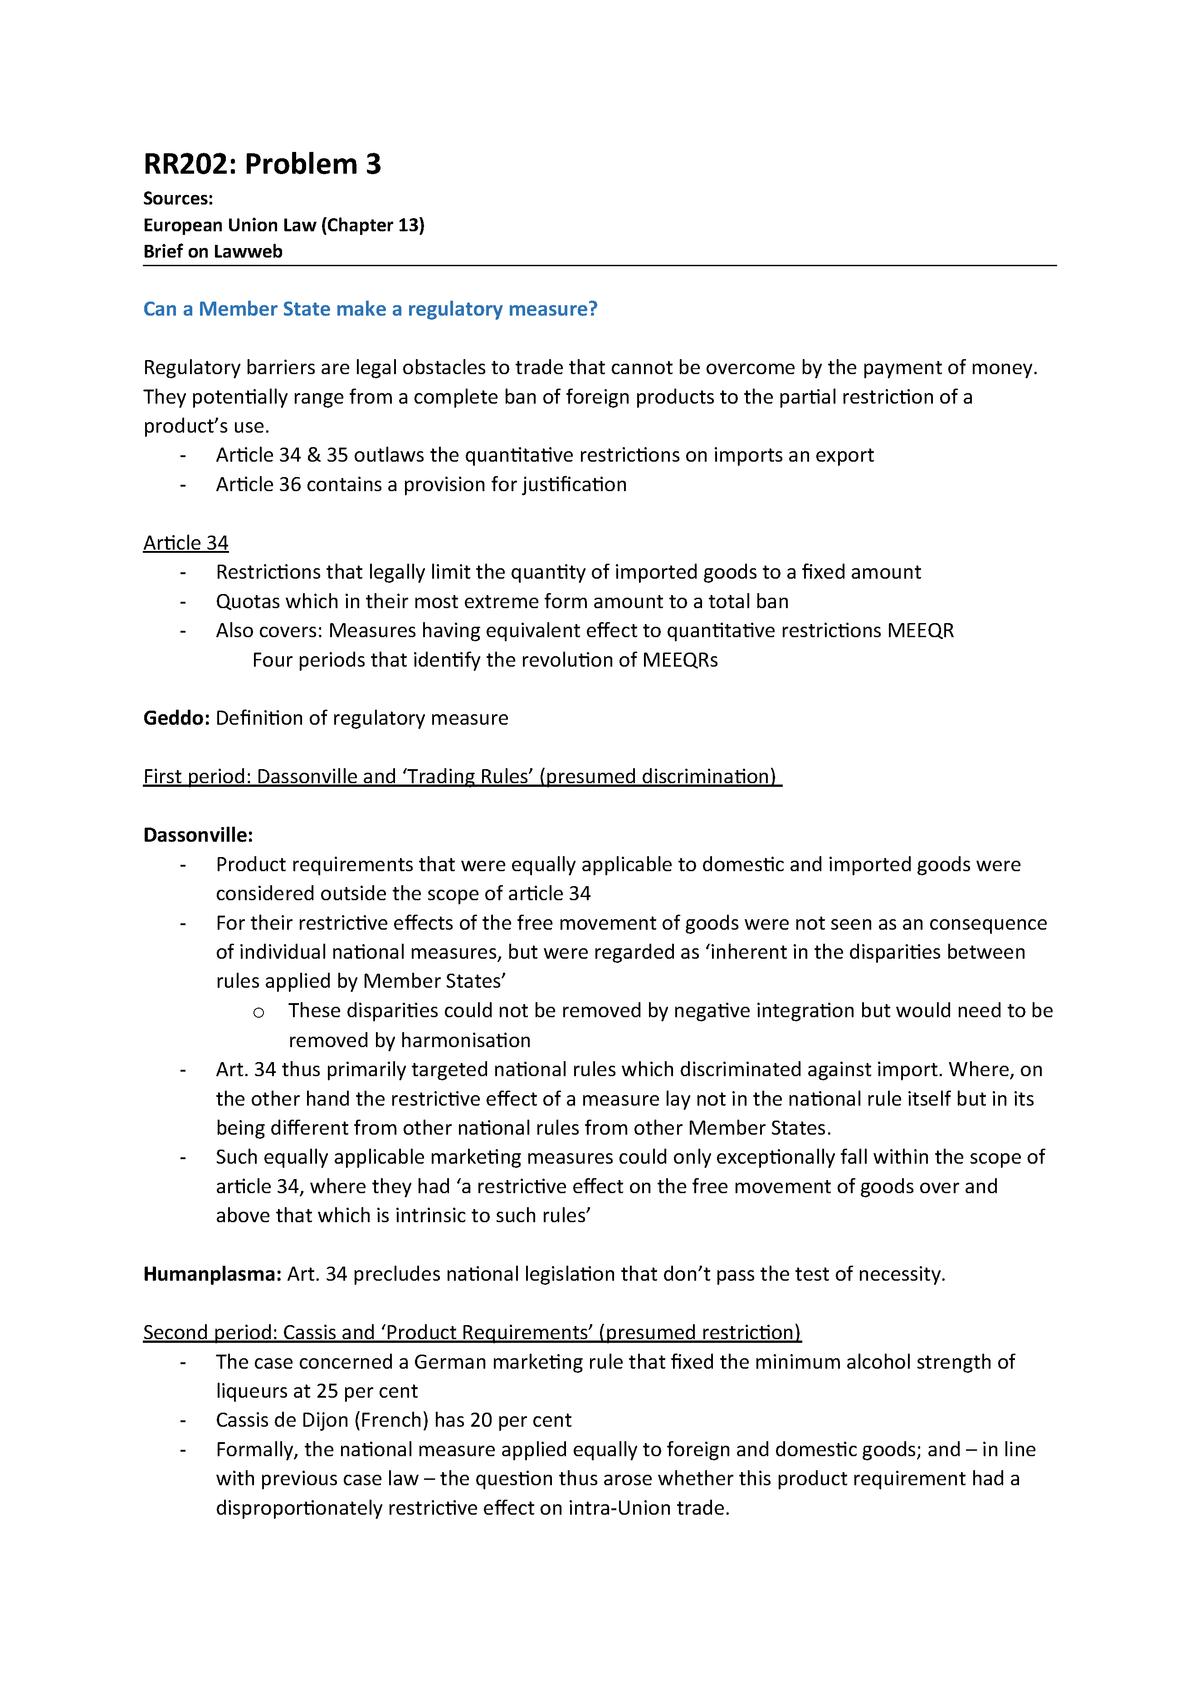 Tutorial Work - Werkgroep 3   European Union Law - RR202